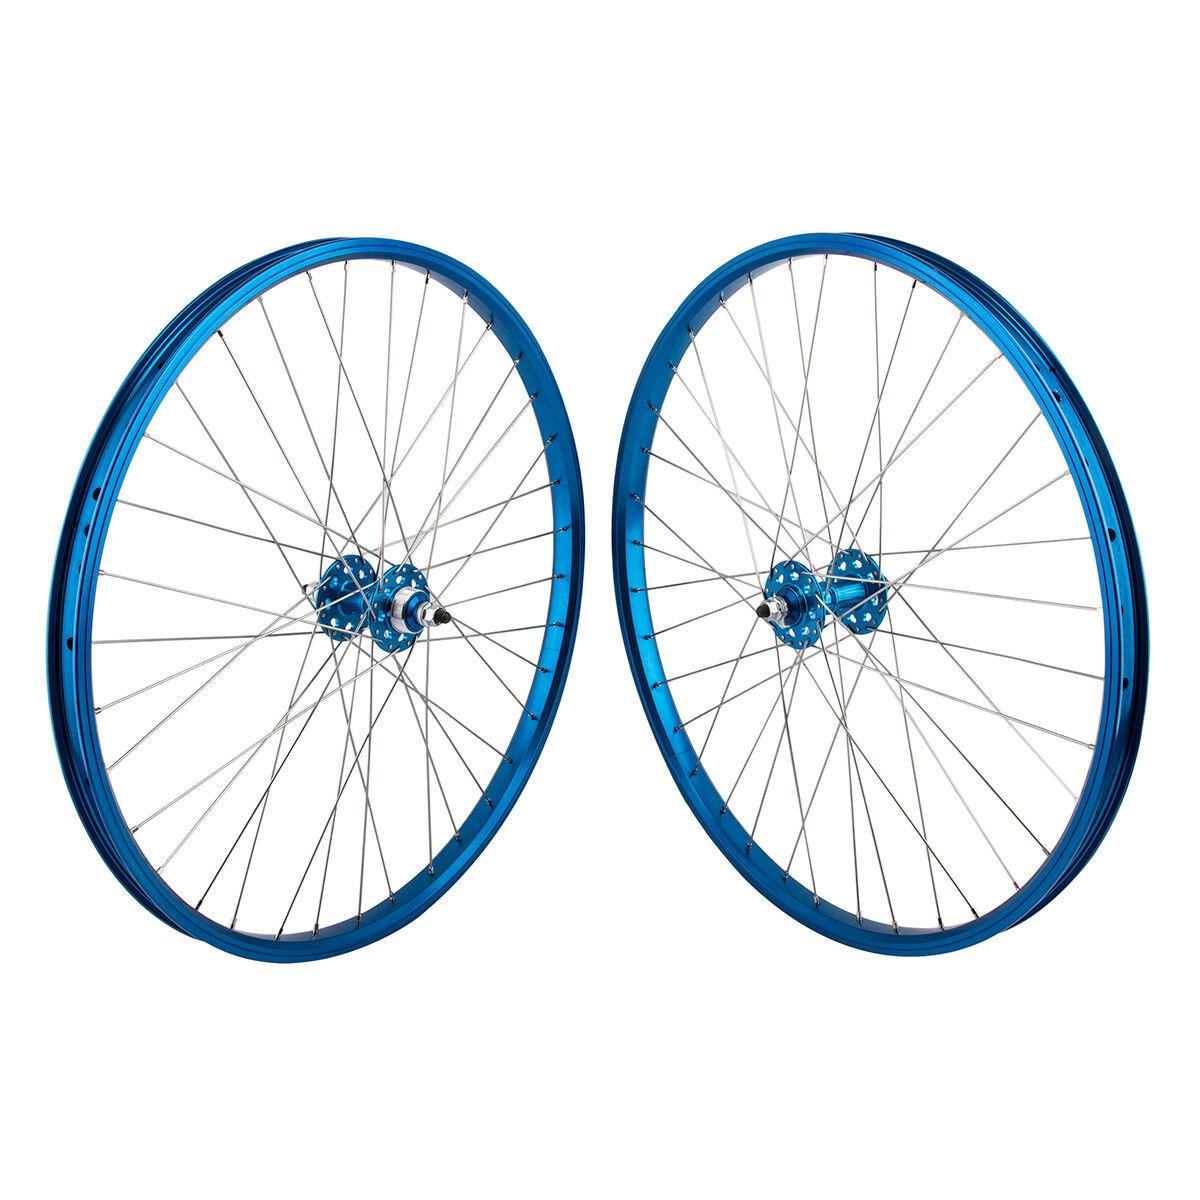 SE Racing Wheelset - 26  - 36H - blueee - Double Wall - Sealed Bearing - FW